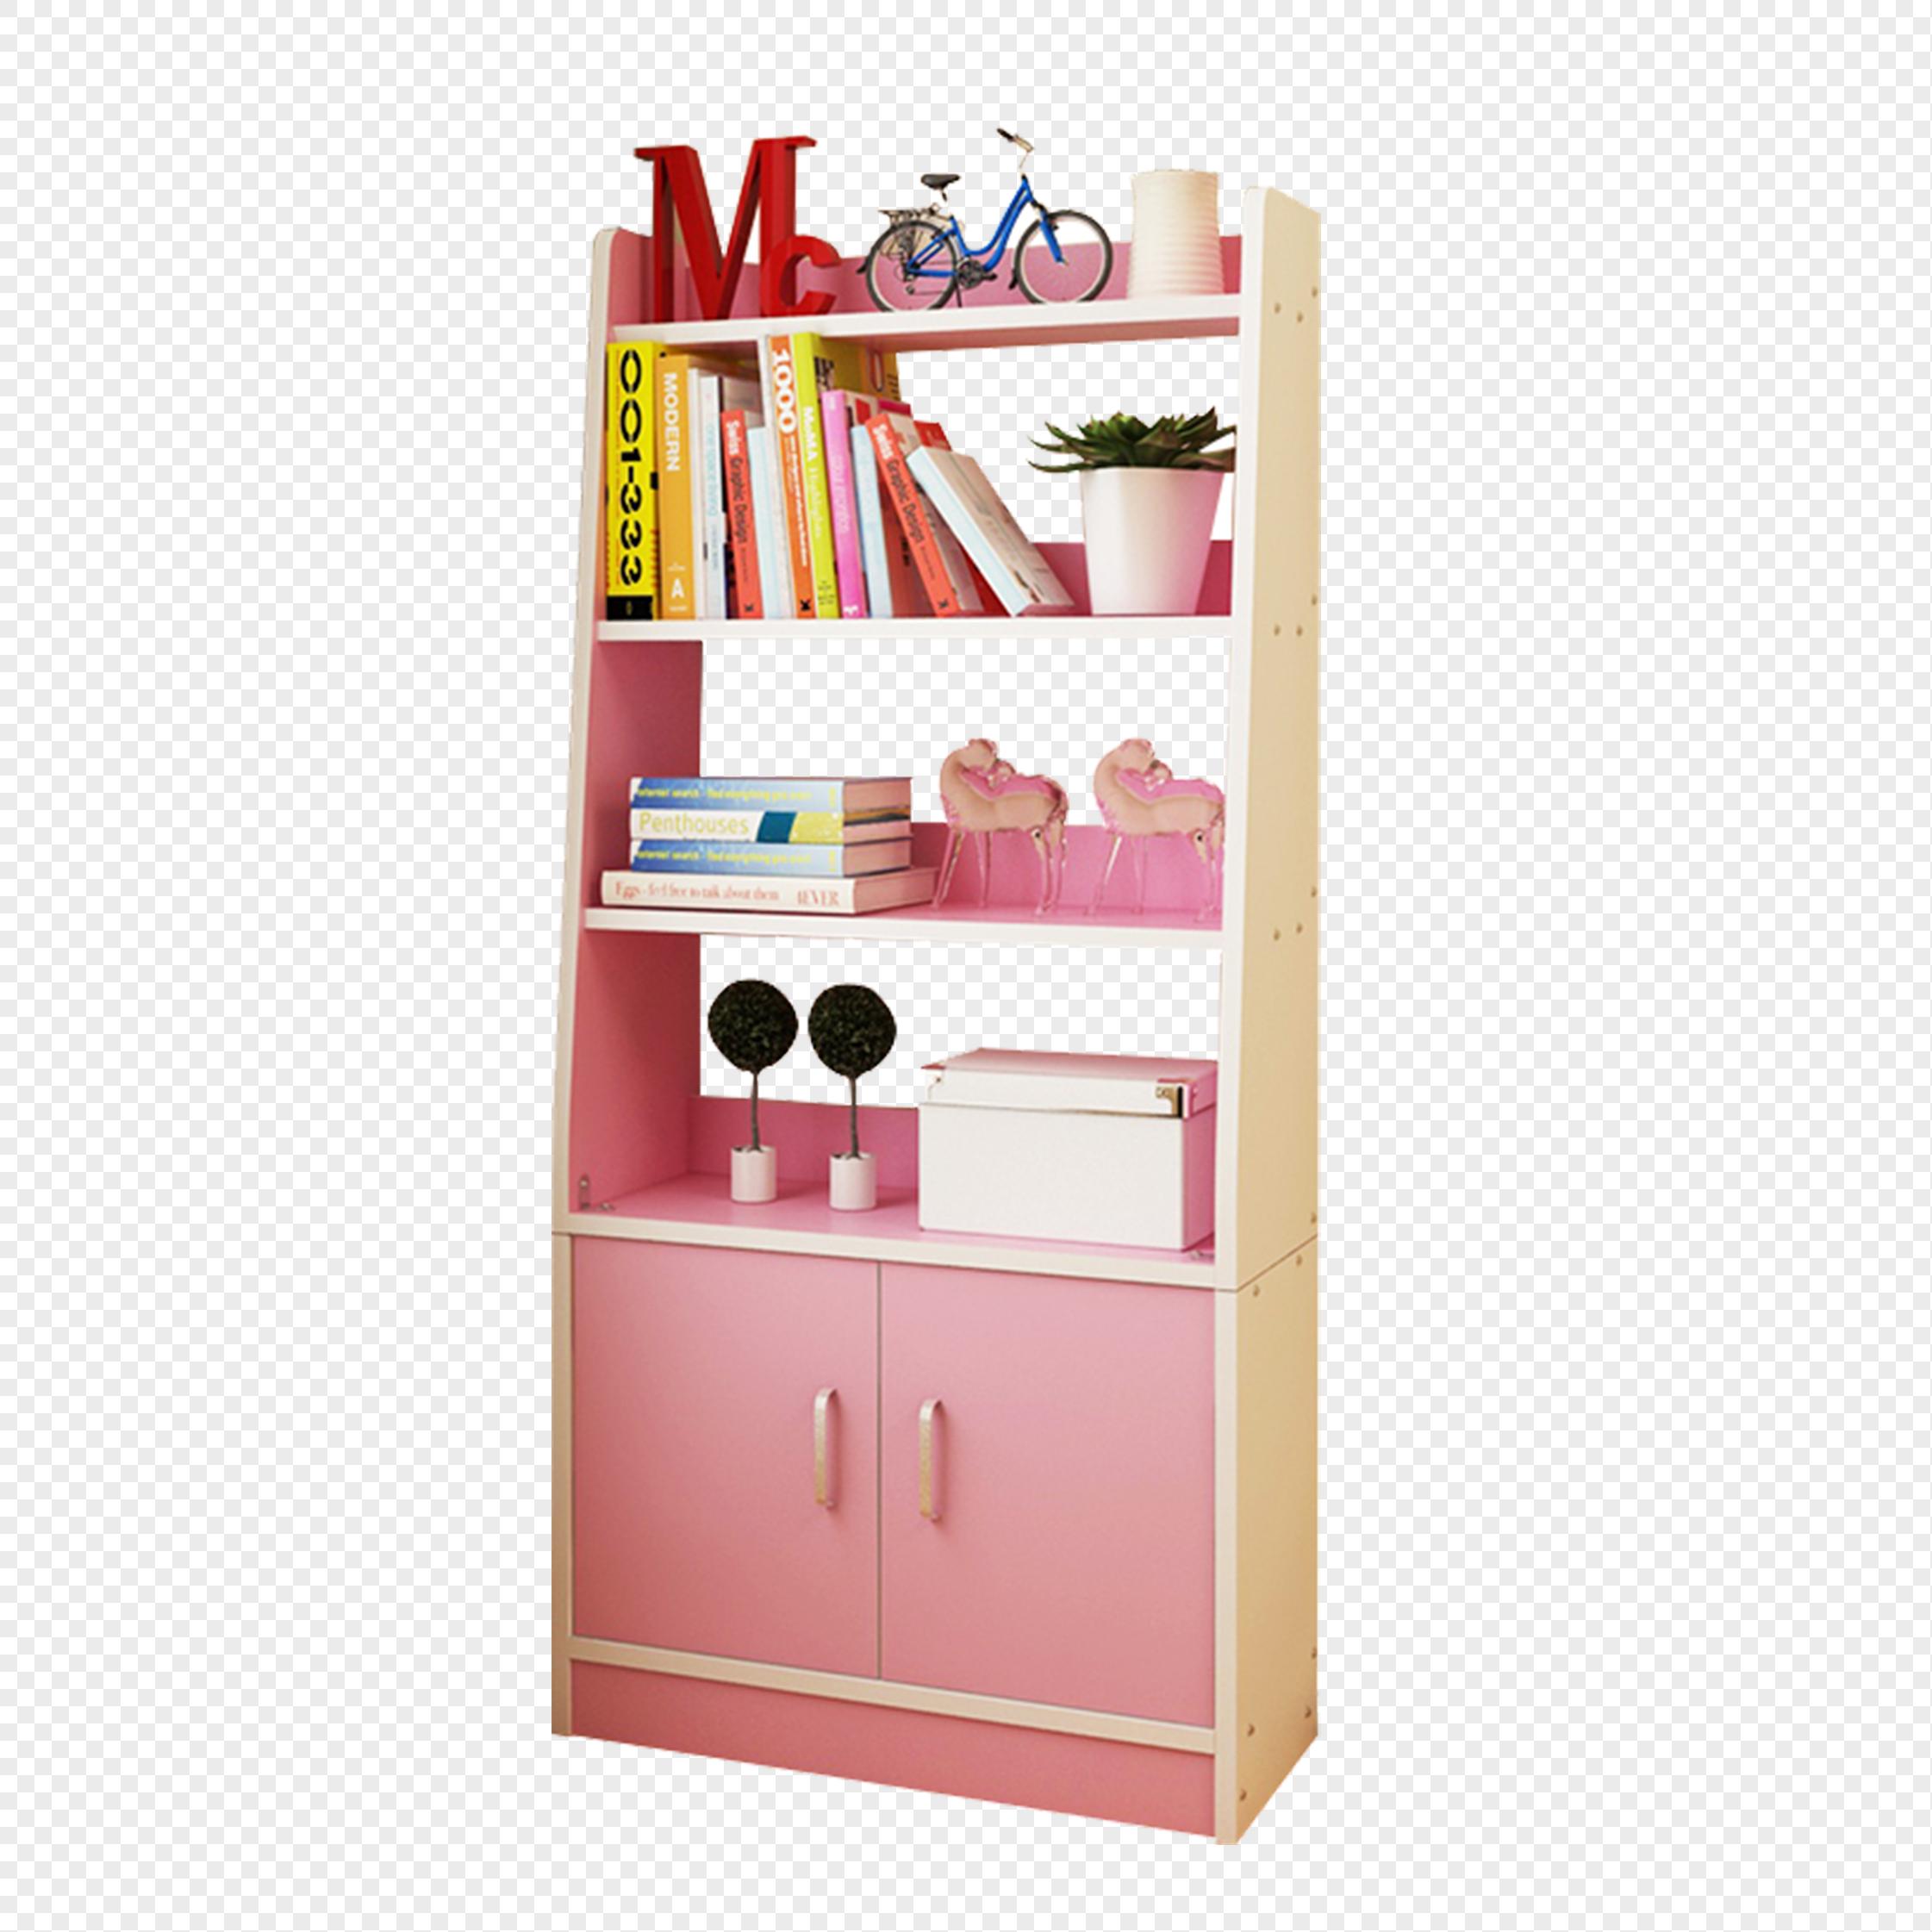 Display Cabinet With Color Lock And Door Lock